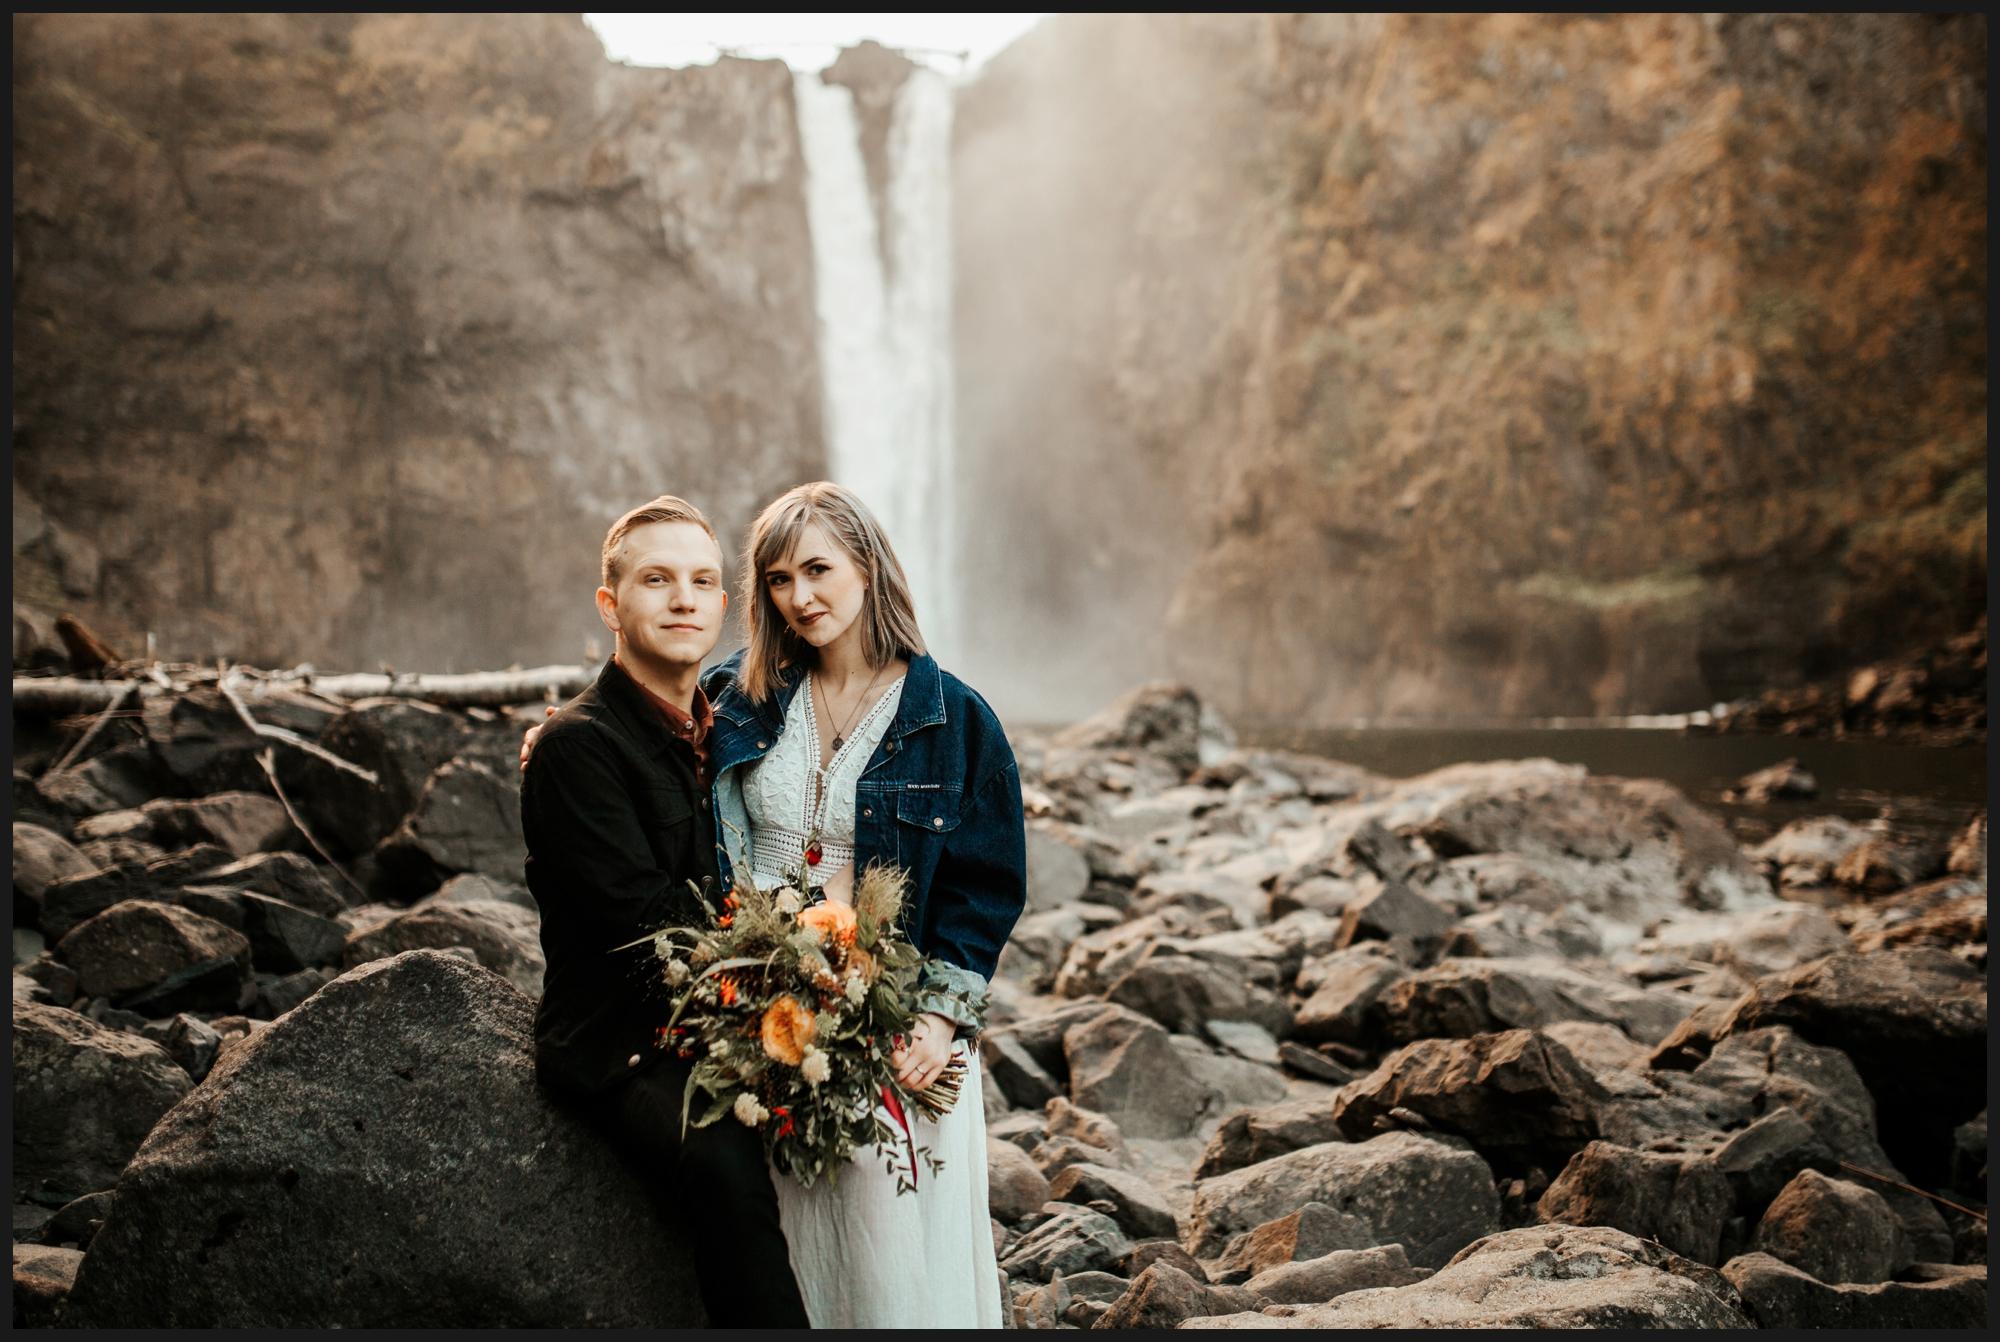 Orlando-Wedding-Photographer-destination-wedding-photographer-florida-wedding-photographer-bohemian-wedding-photographer_0413.jpg